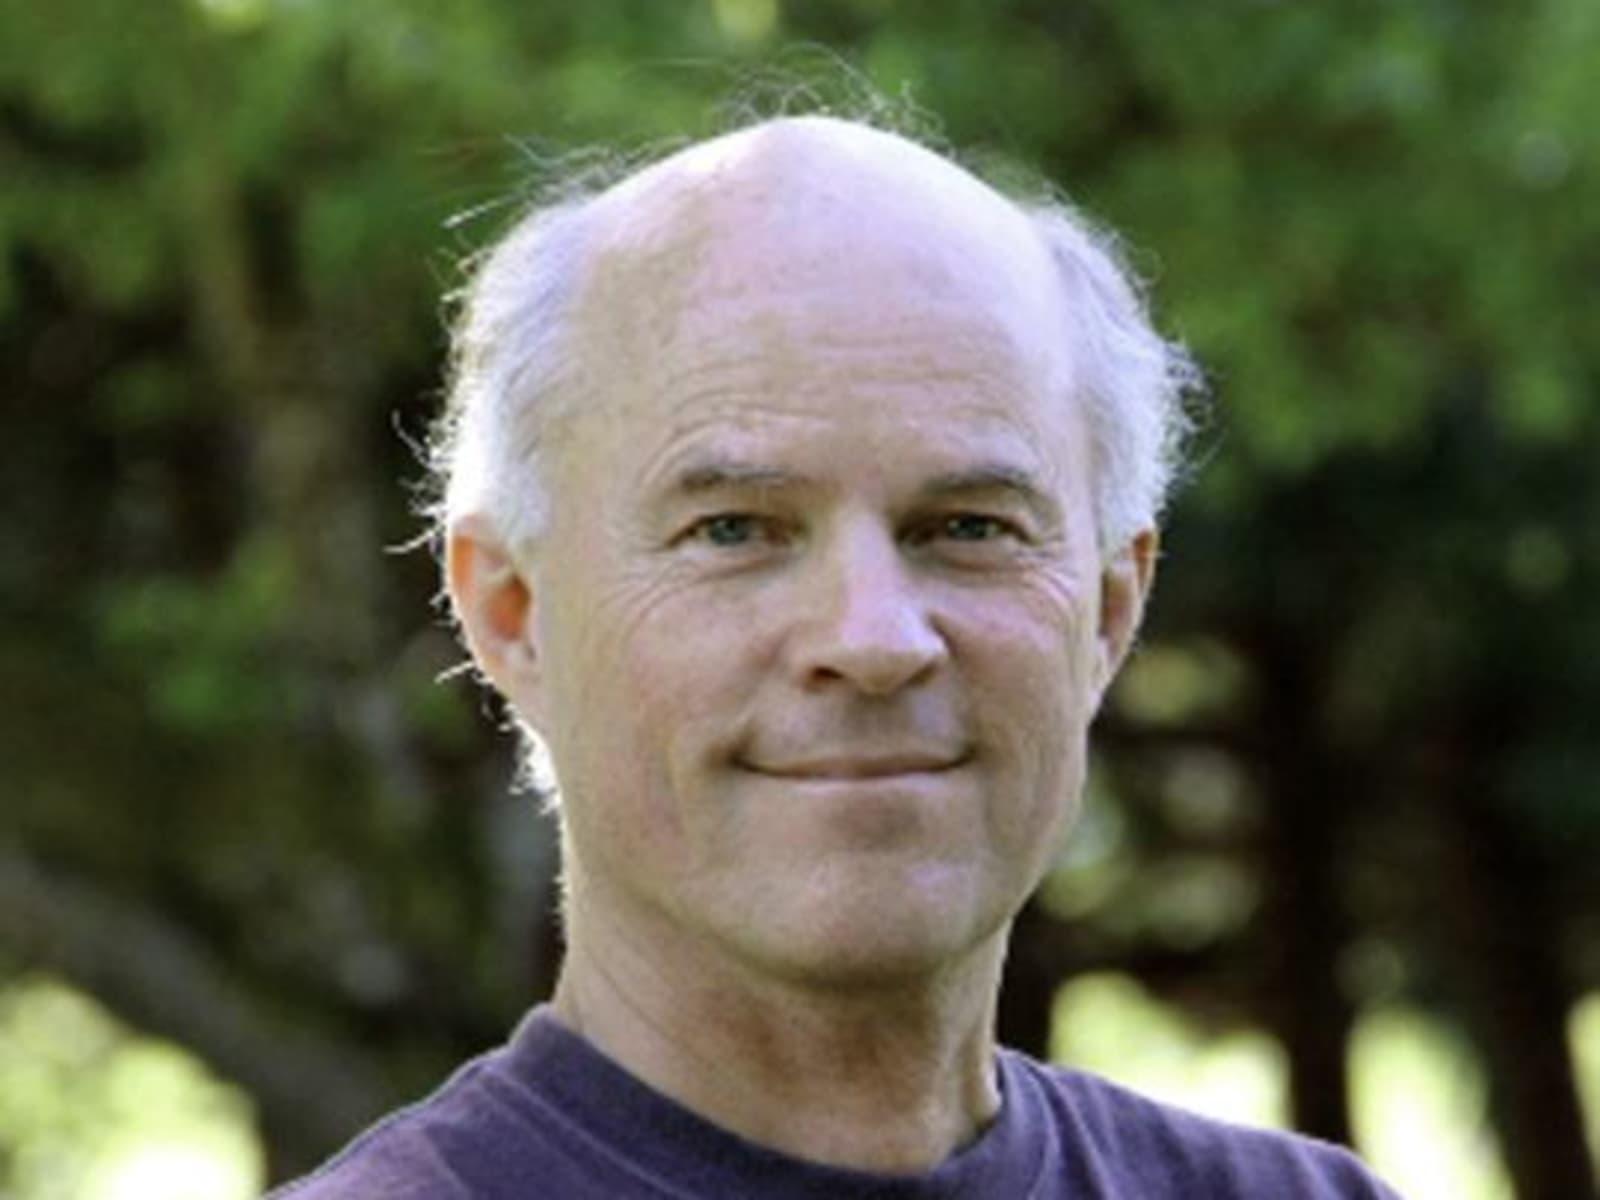 Mark from Corvallis, Oregon, United States